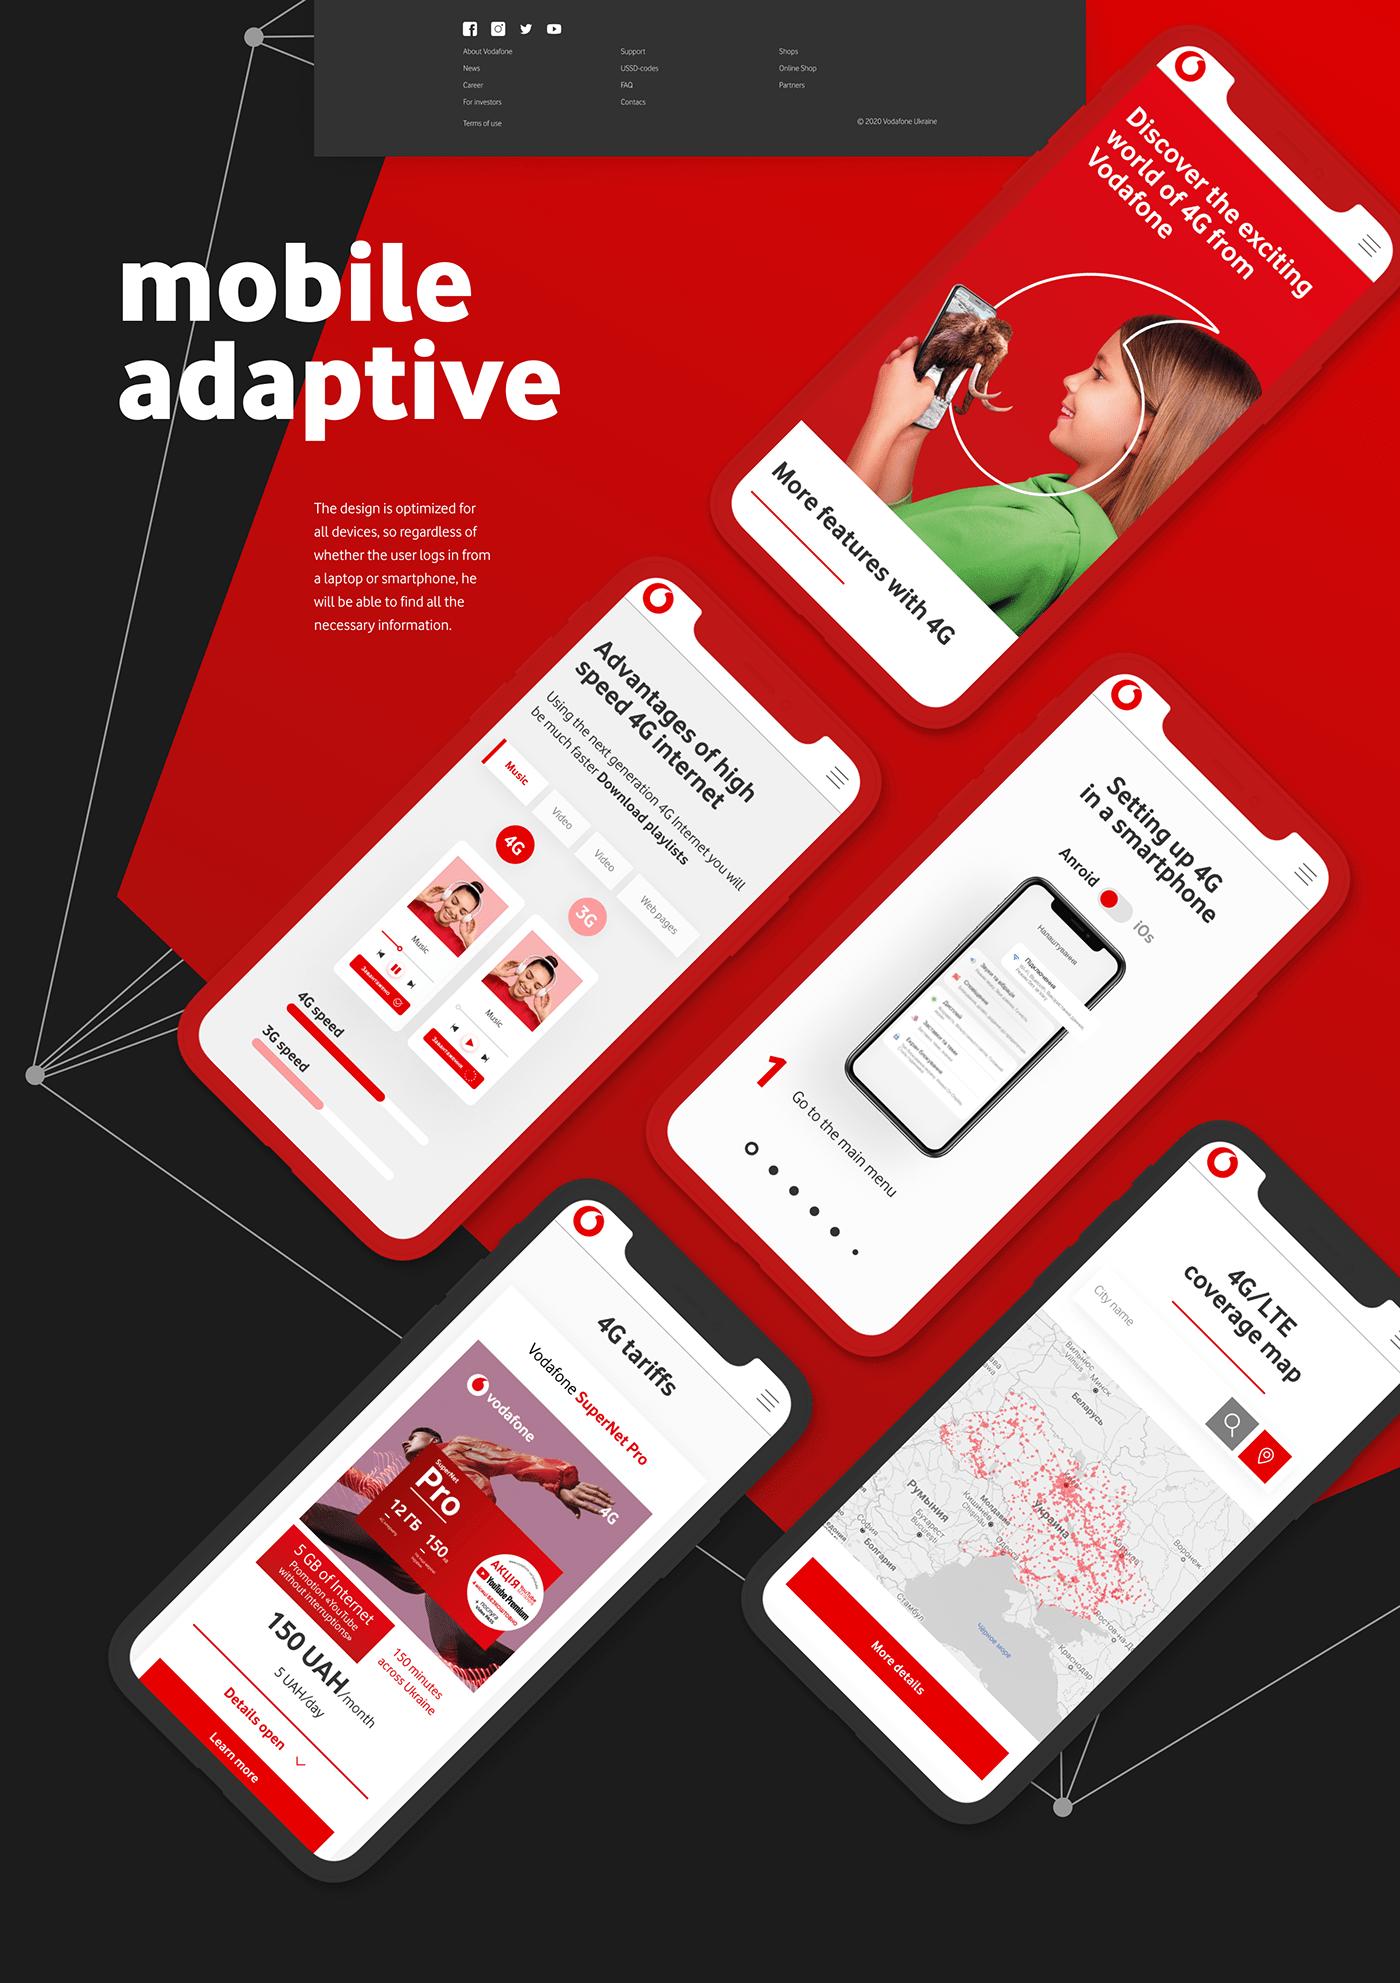 4G Internet animation  design development Interface site UI/UX vis-a-vis vodafone Web